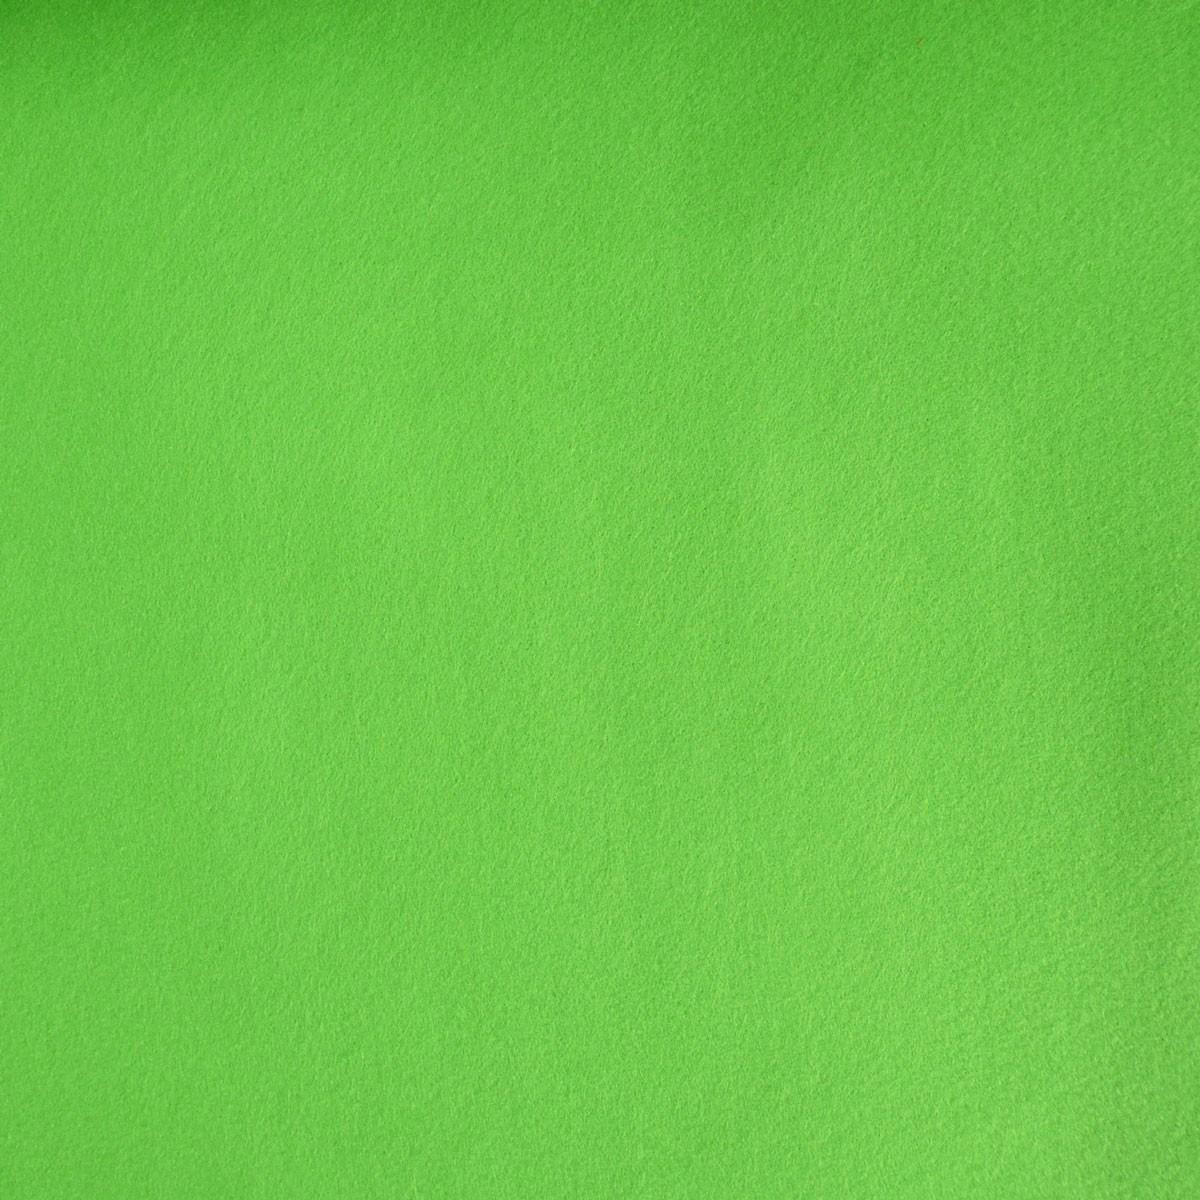 Kreativstoff Filz einfarbig apfelgrün 180cm Breite 2mm Stärke